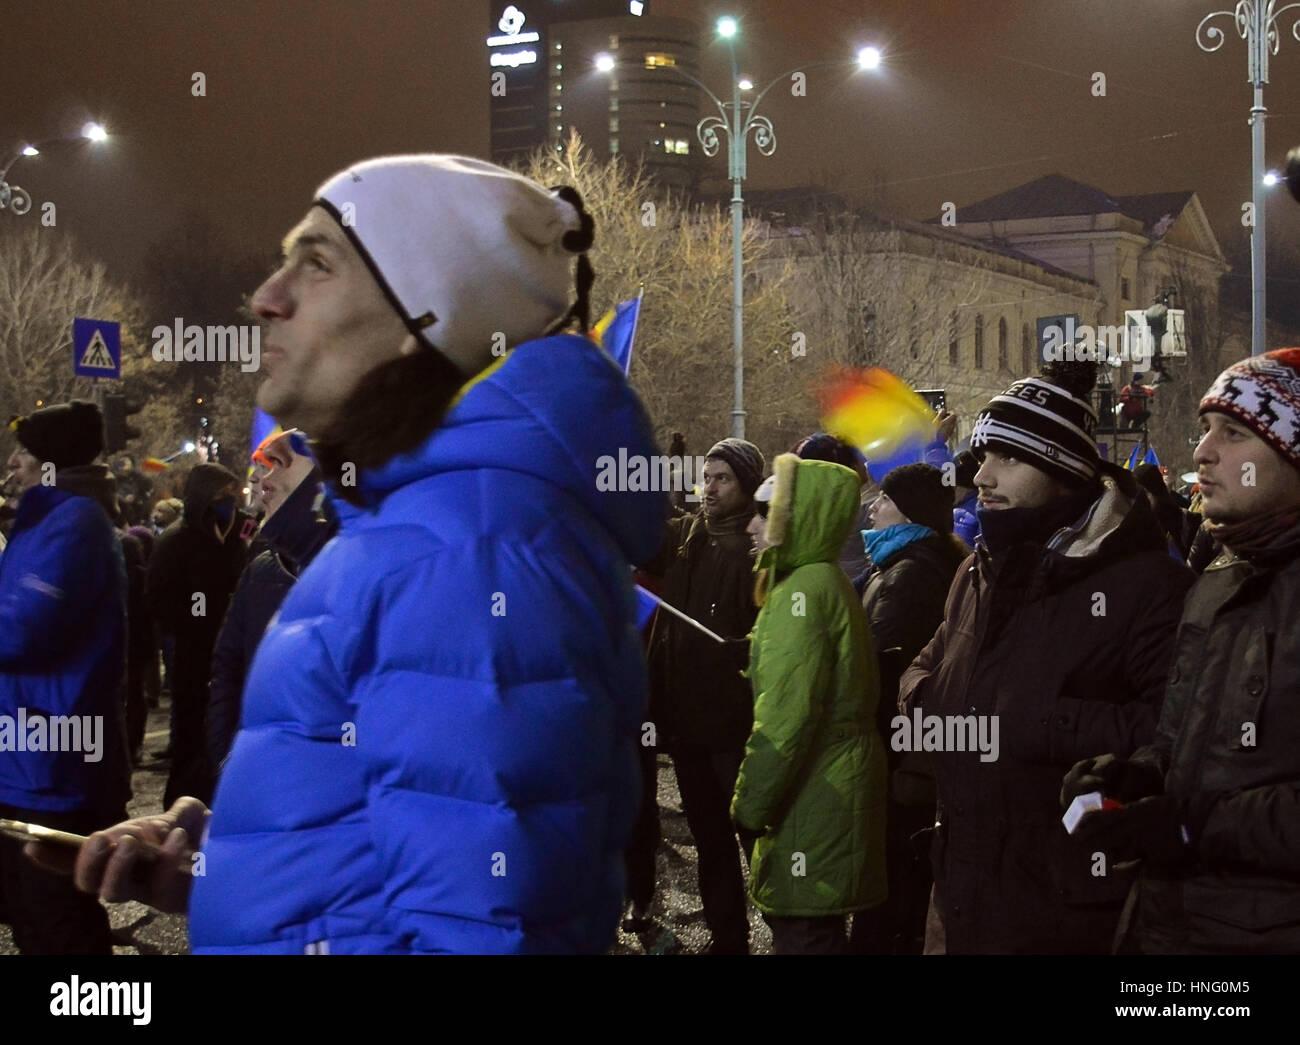 Bucharest, Romania. 12th February 2017. In temperatures of -7C, 70,000 protesters in Piata Victoriei (Victory Square) - Stock Image